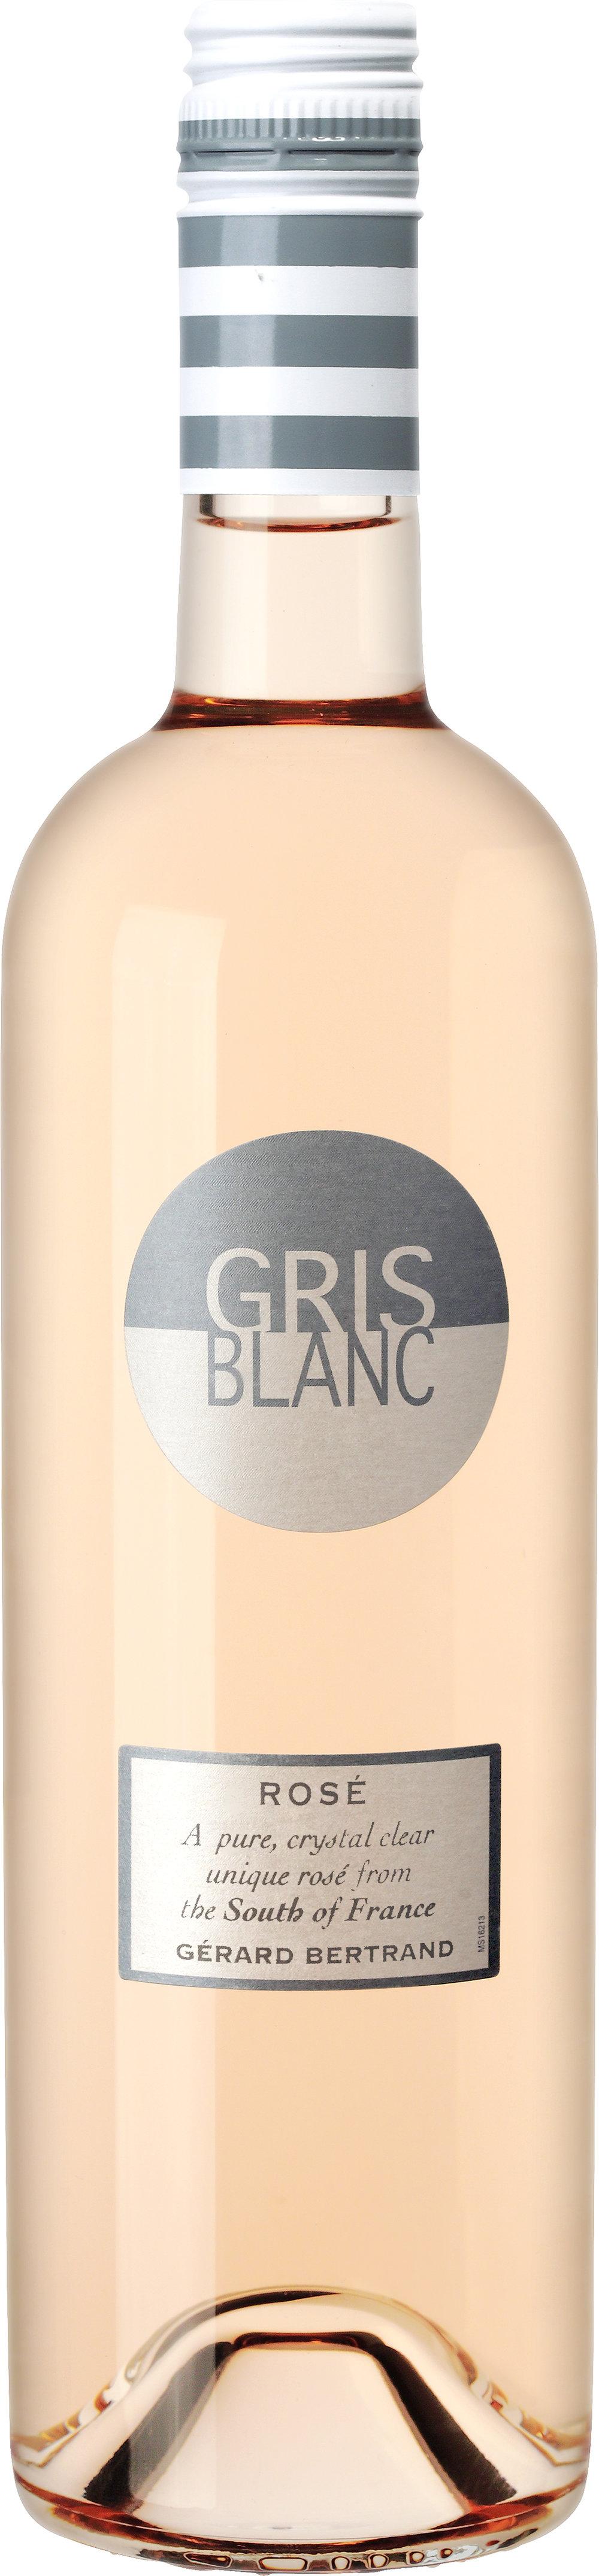 GRIS BLANC A VIS 300DPI USA.jpg